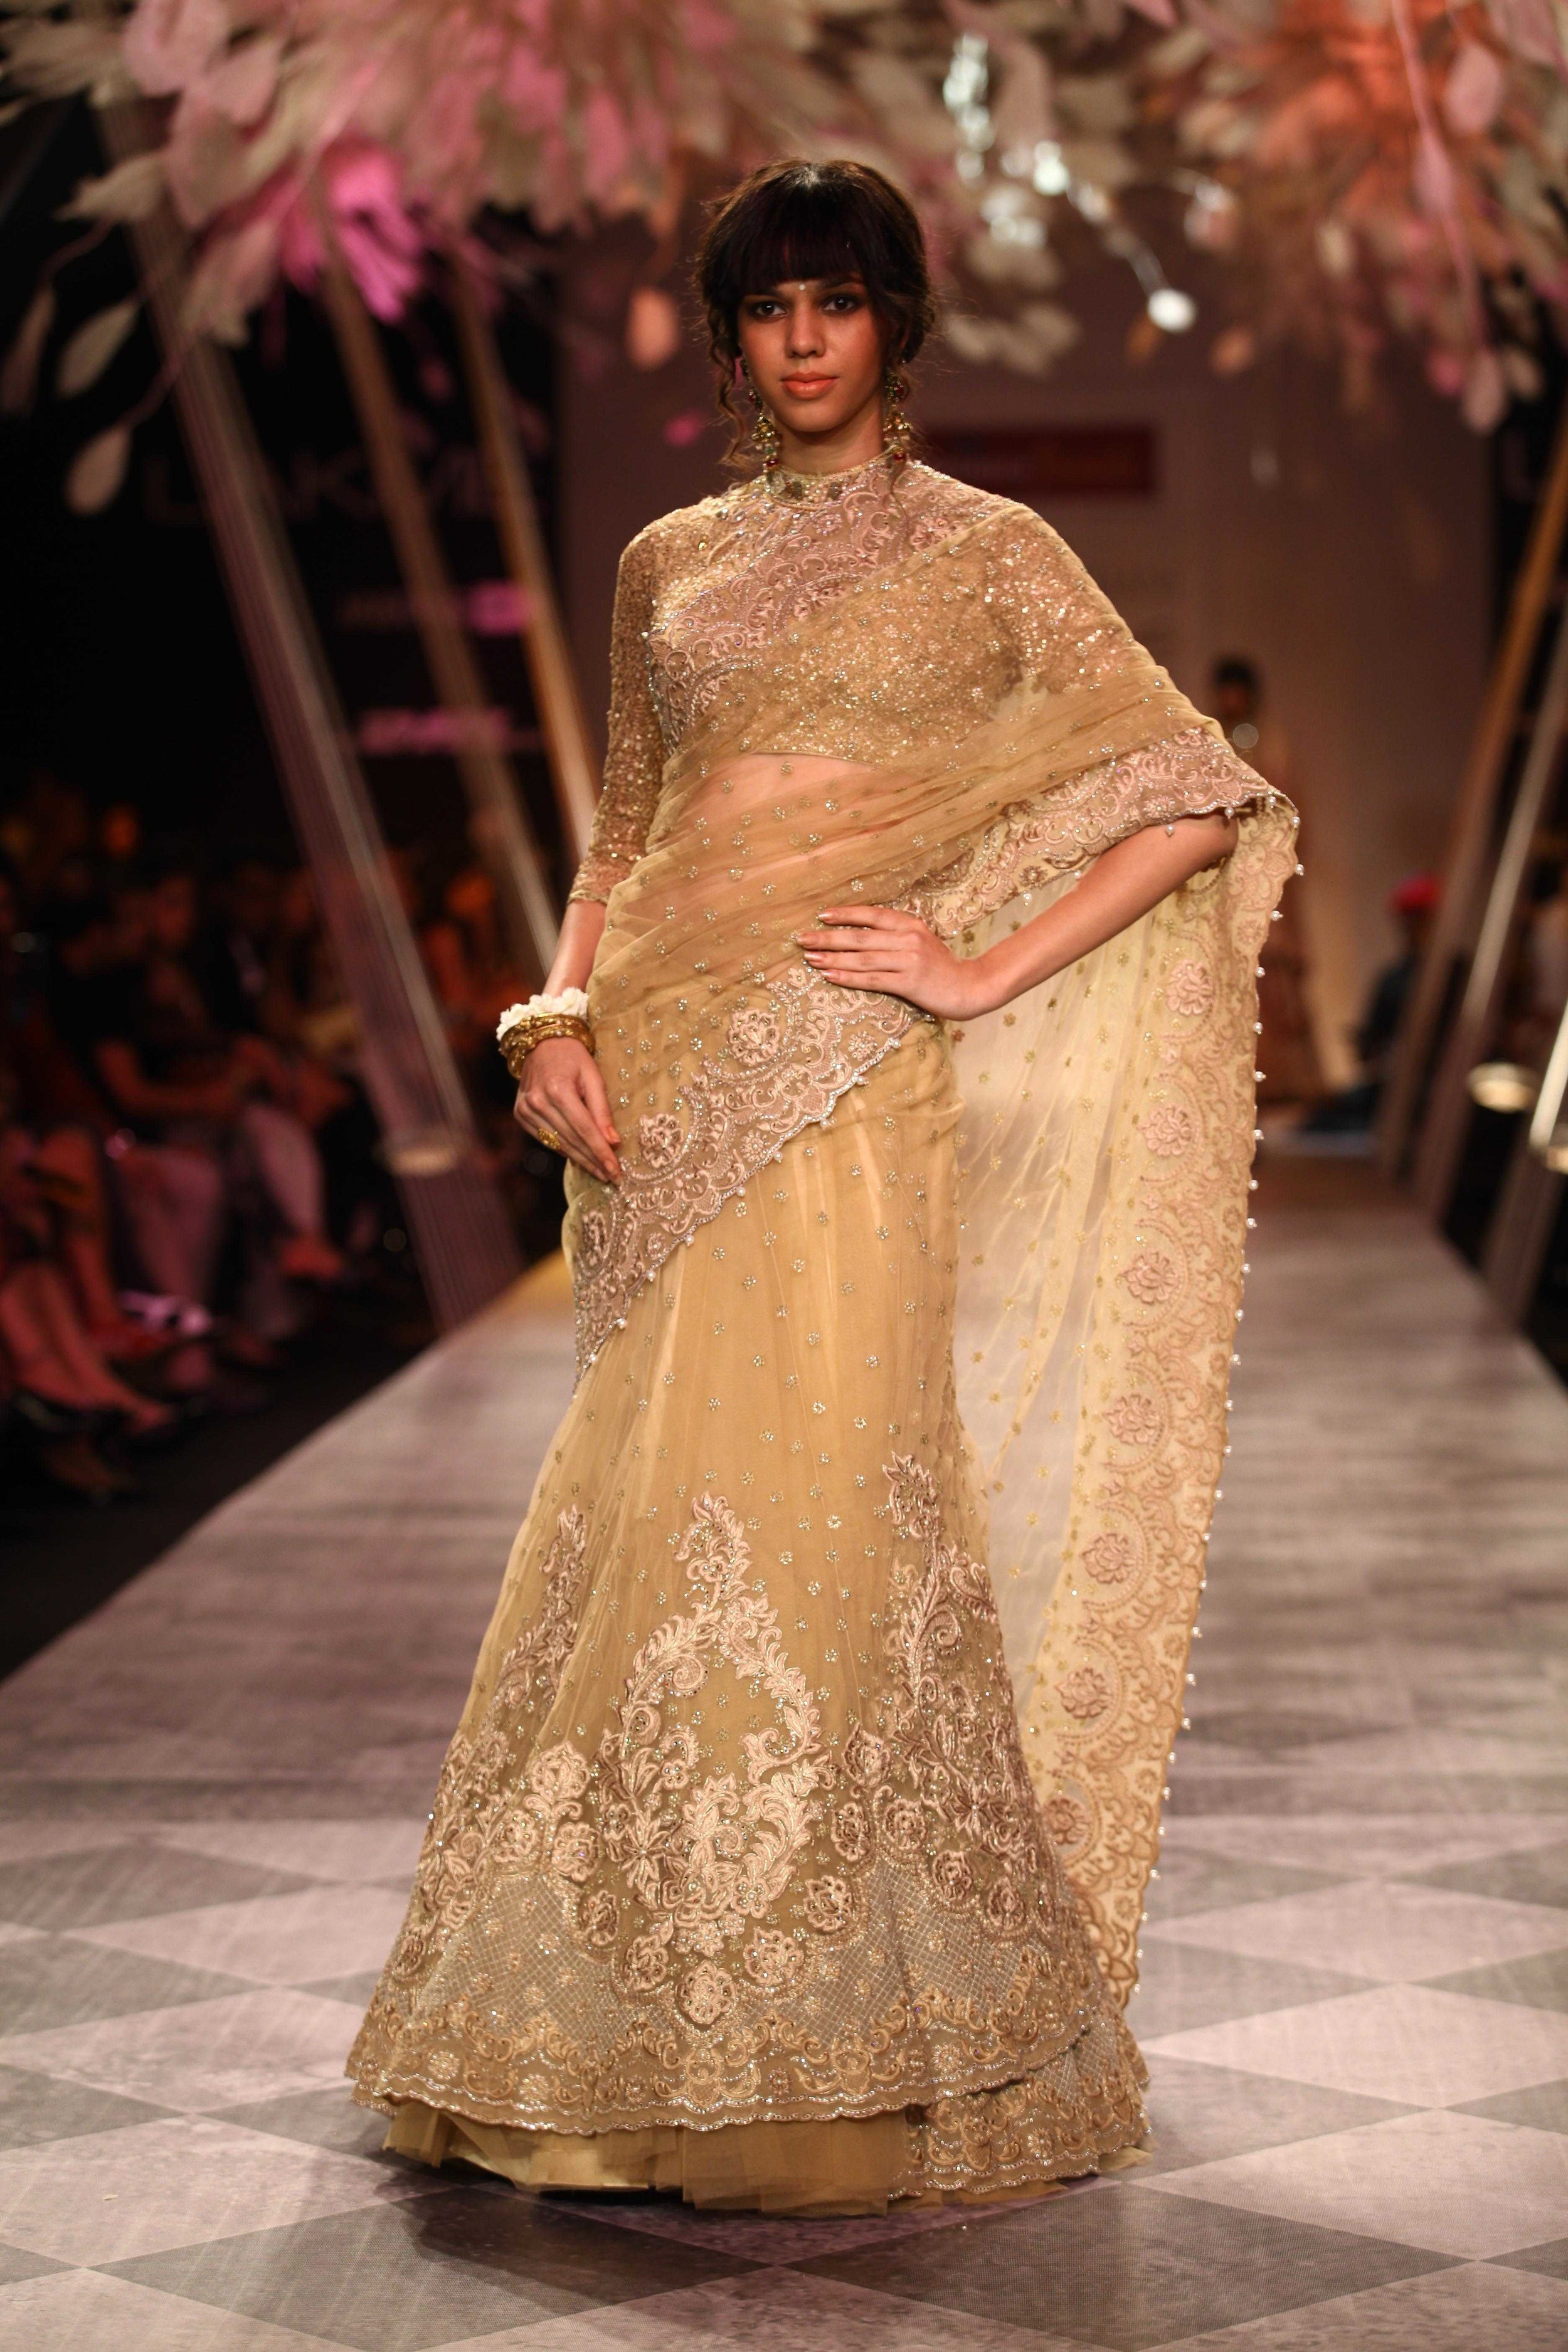 Tarun Tahiliani SS'14 Collection at LFW SR 2014 16.jpg